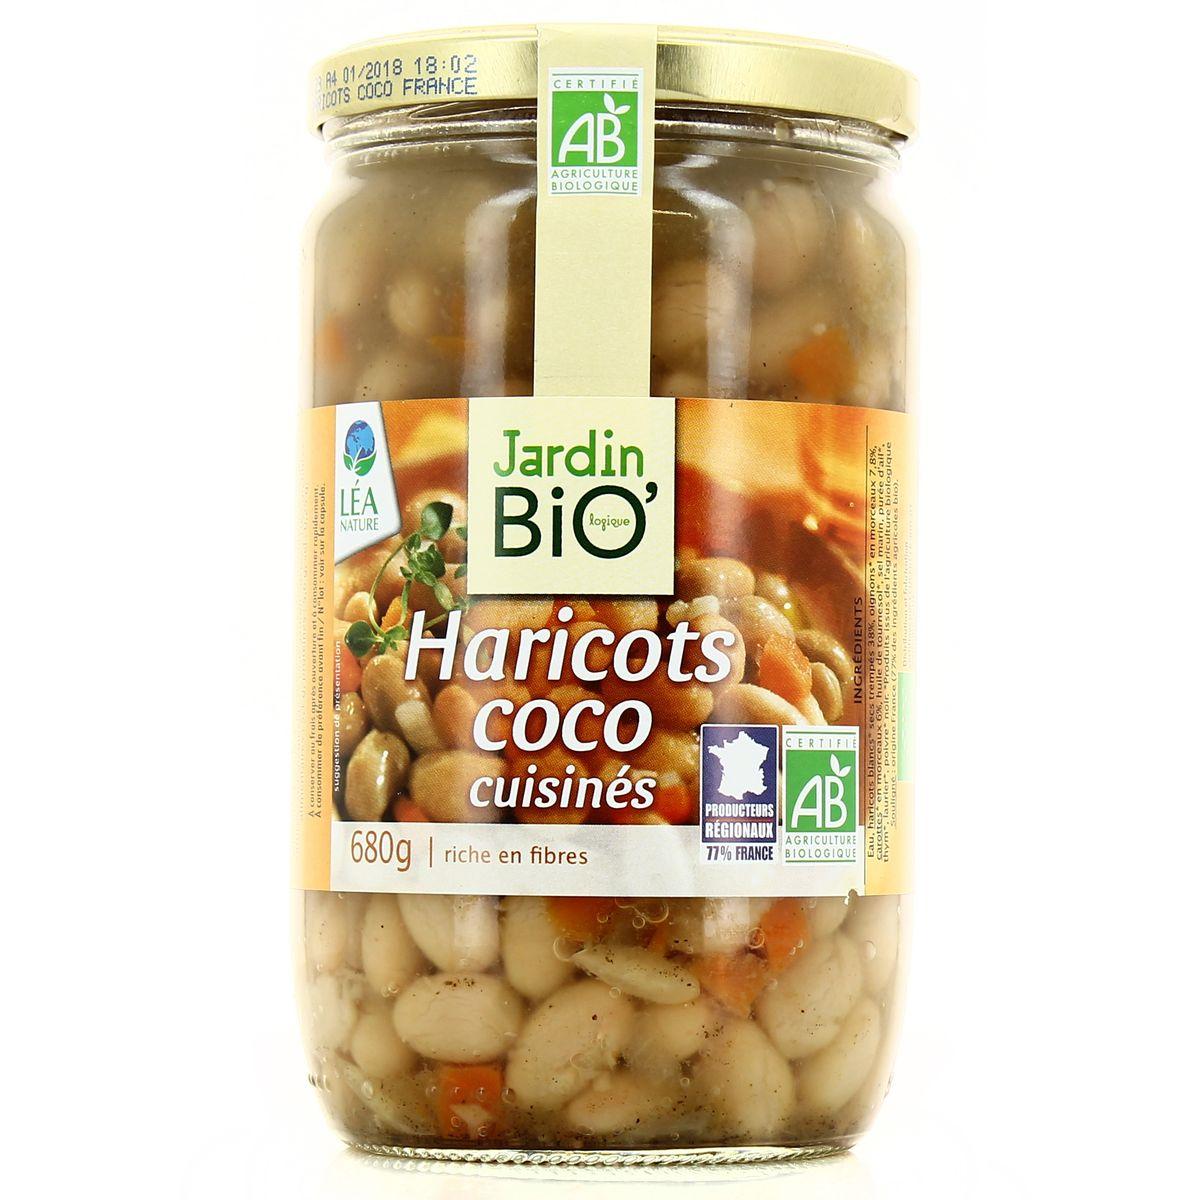 Haricots coco cuisinés BIO, Jardin Bio (680 g)